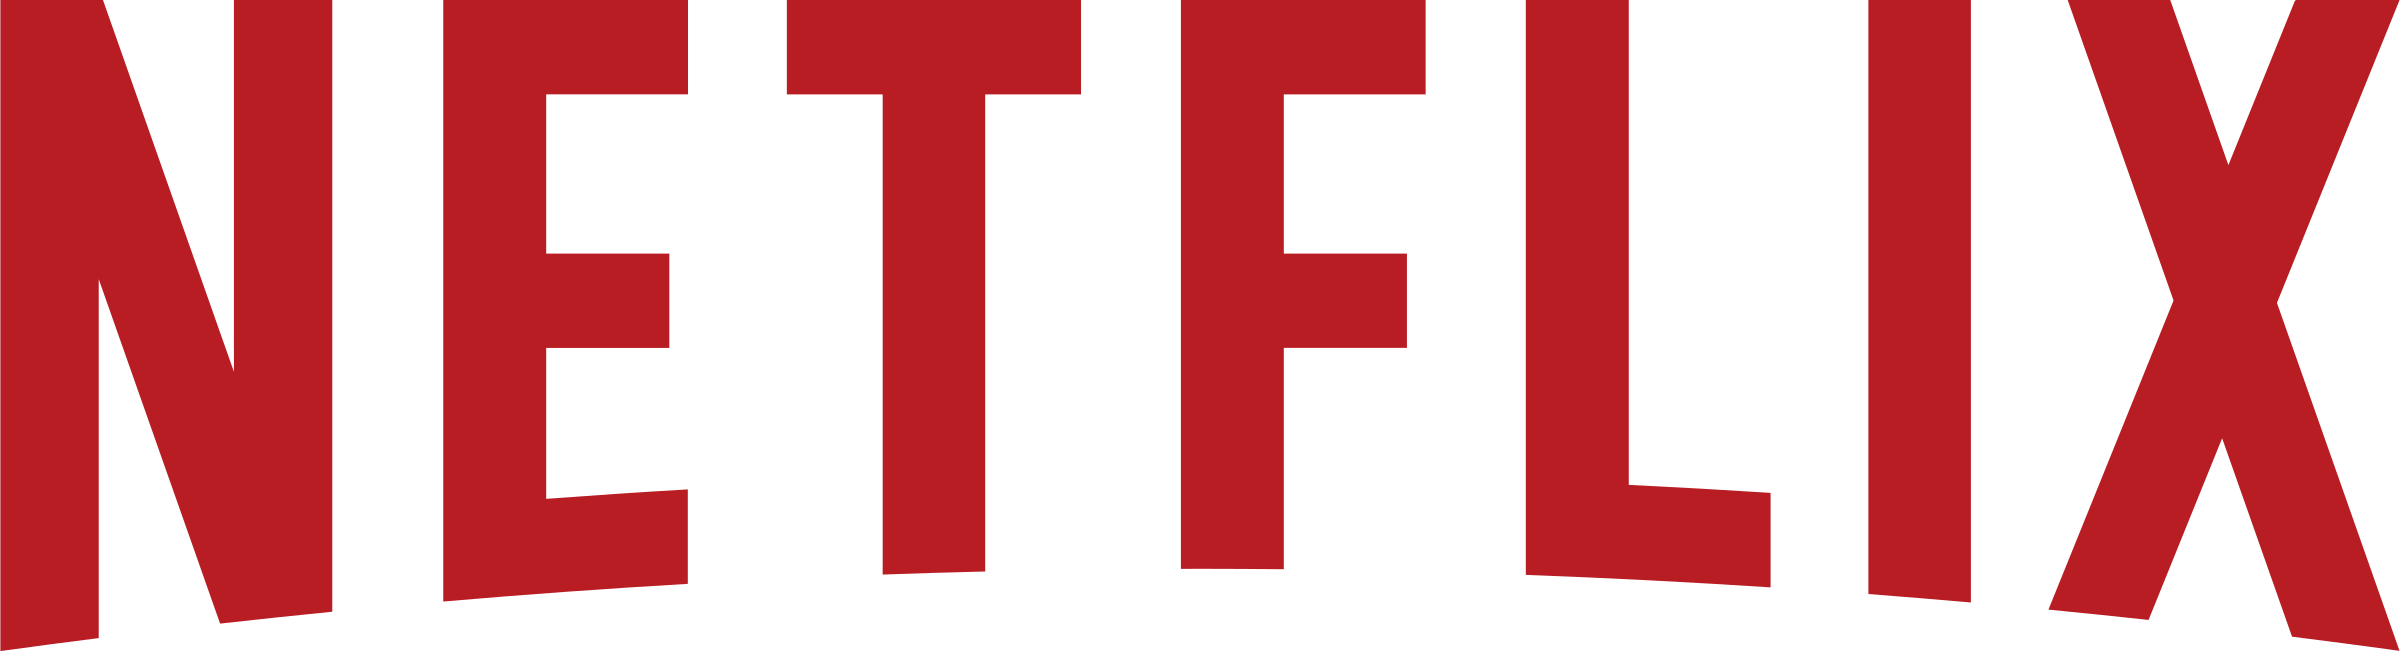 netflix-2-logo-png-transparent.png